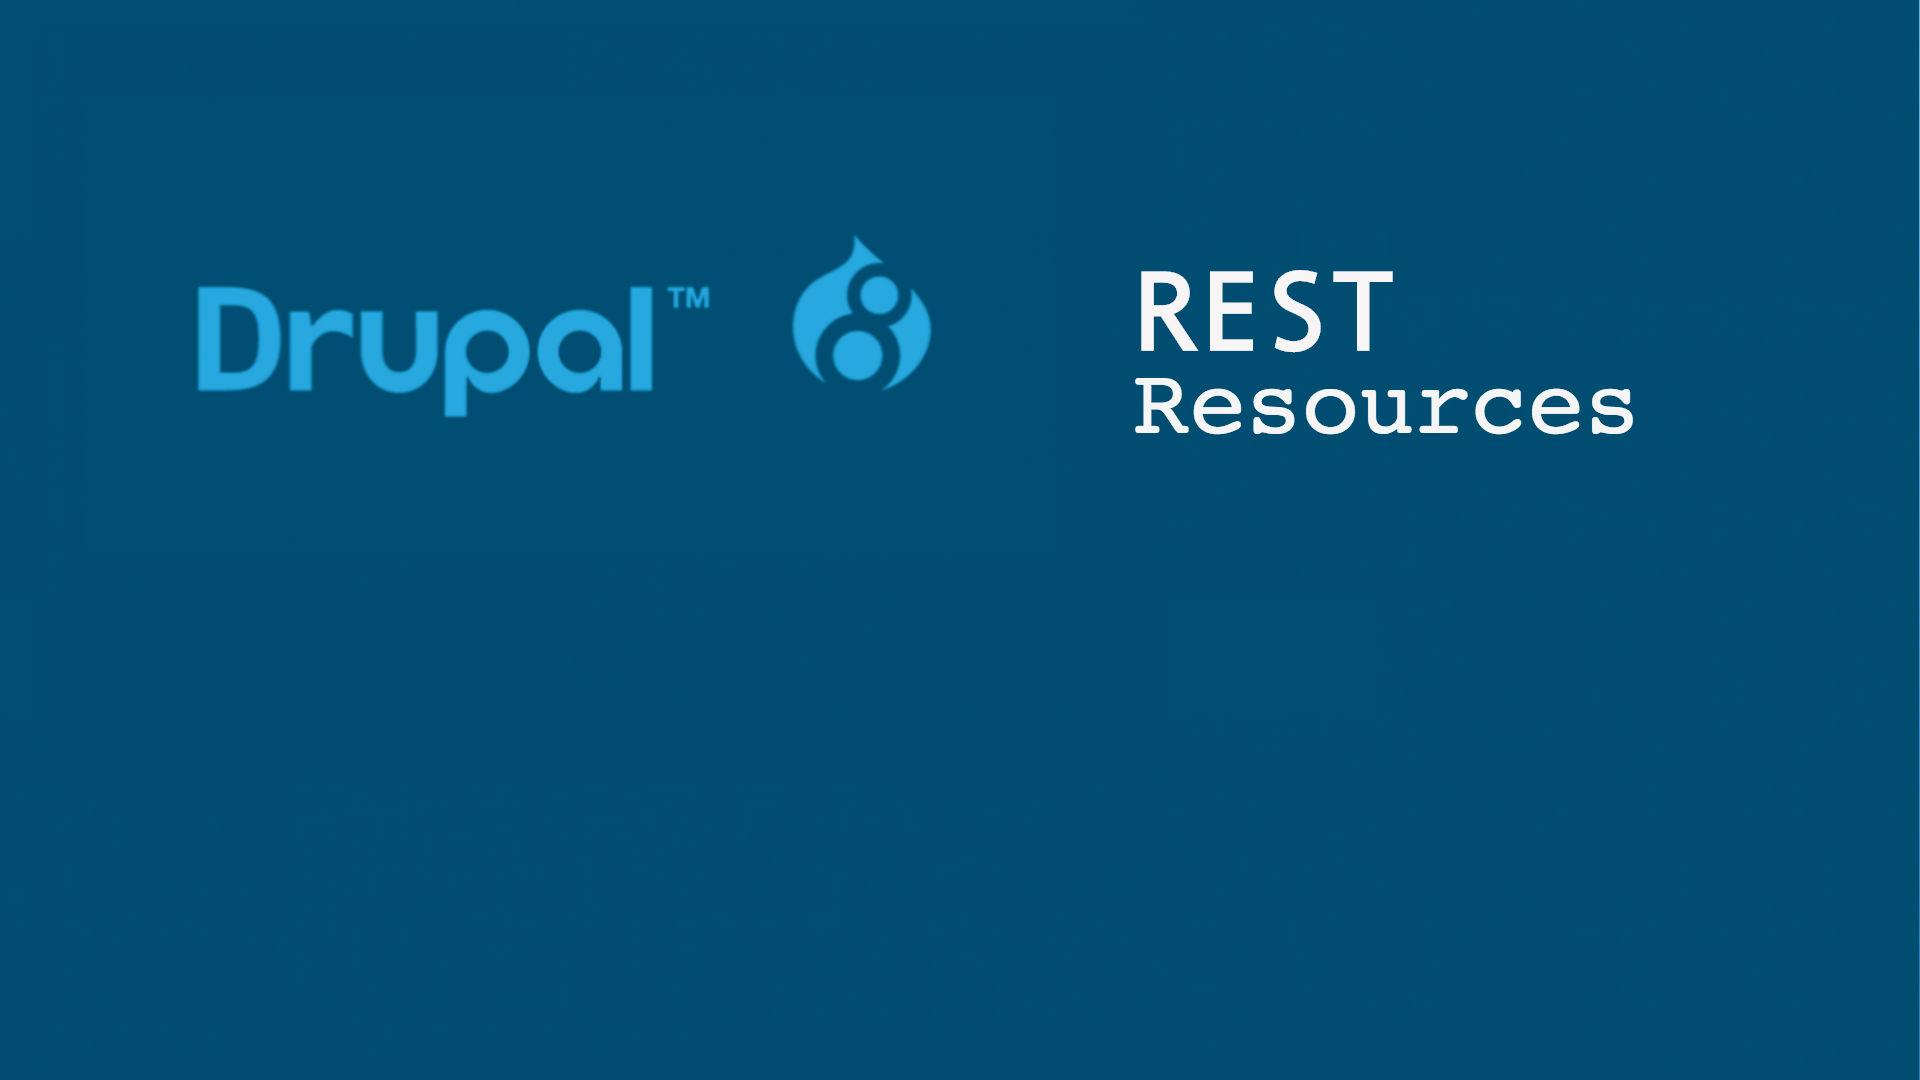 Create Rest Resource for GET Method in Drupal 8 | Valuebound